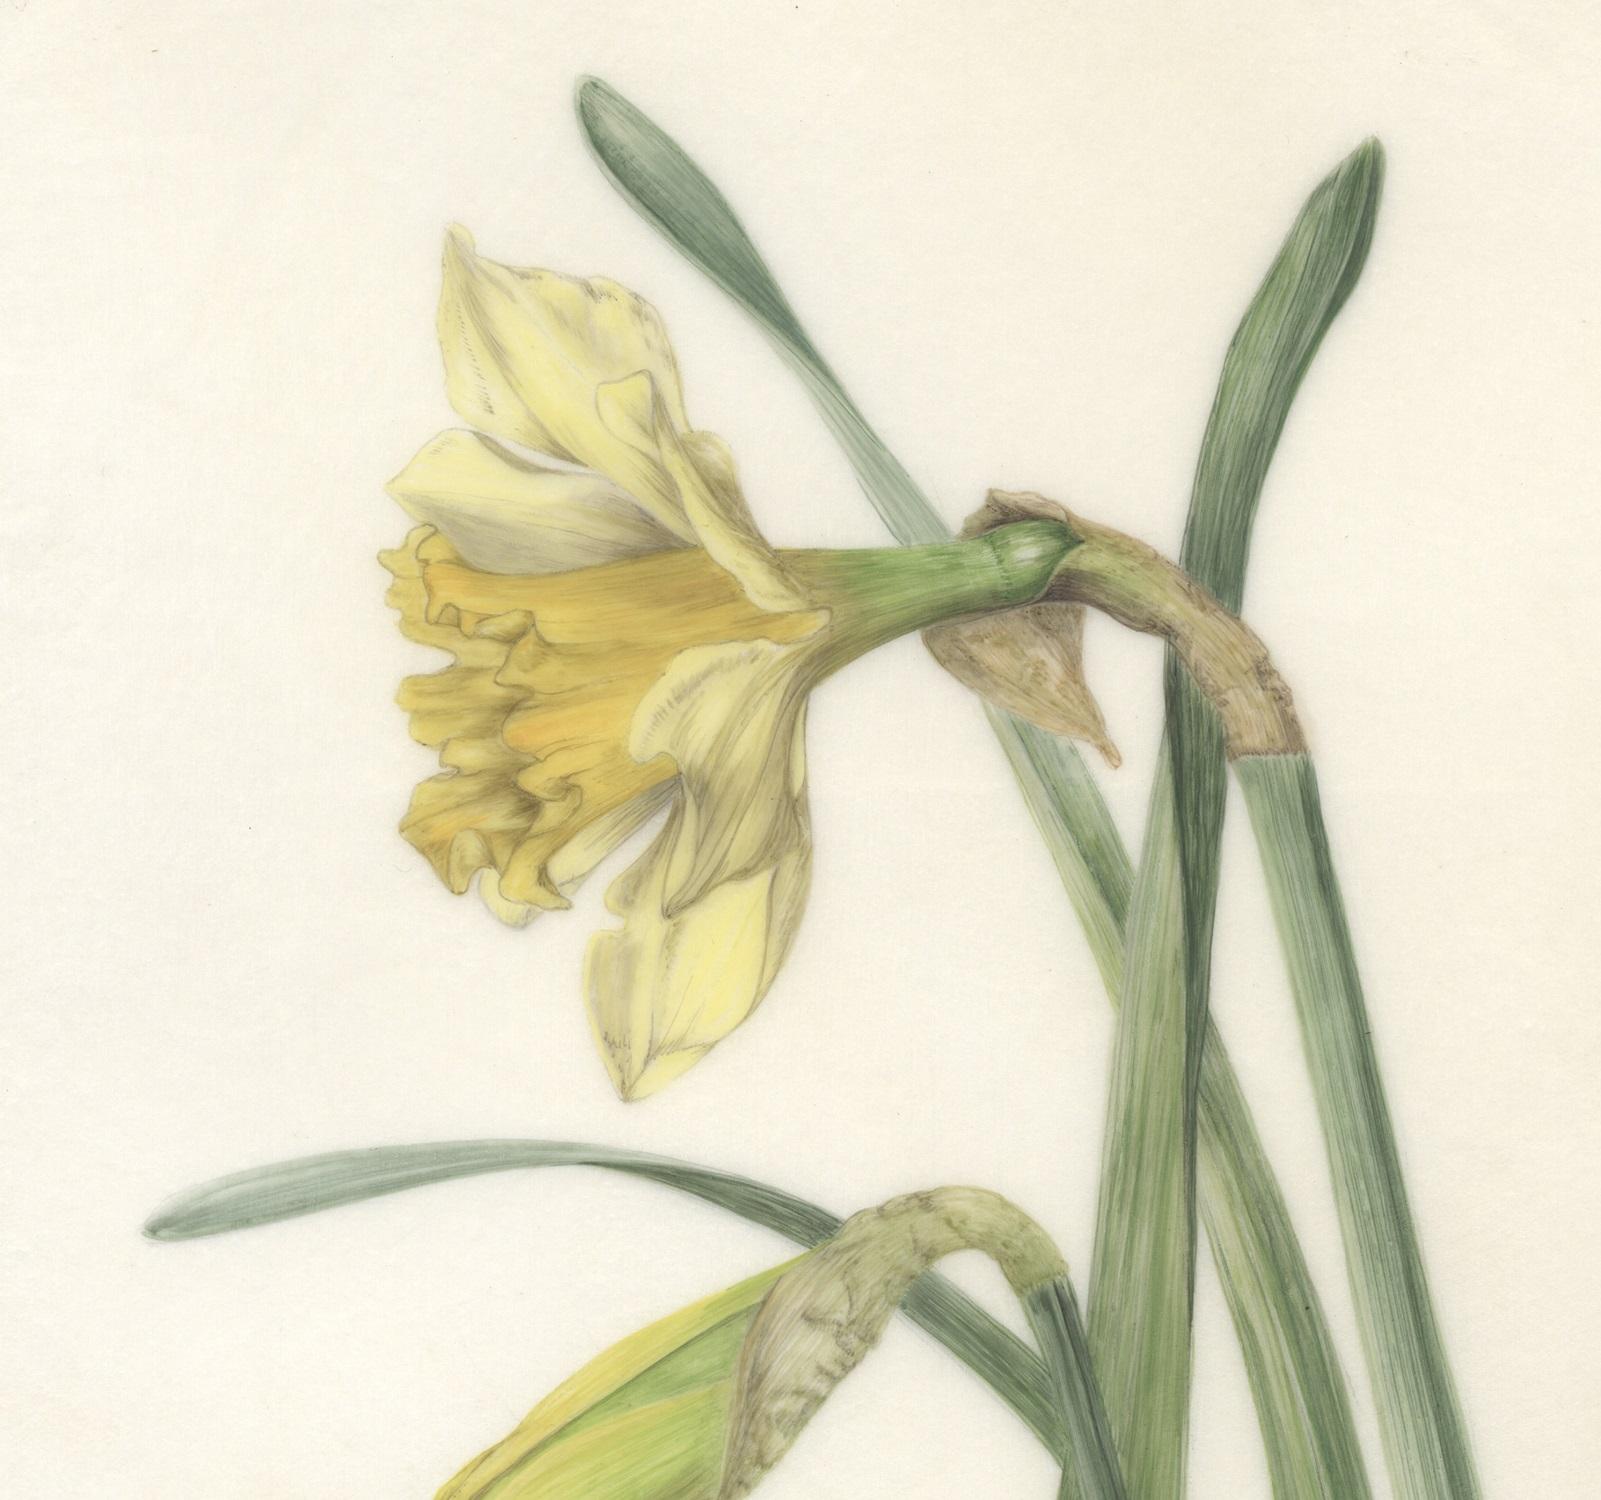 Daffodil and Bud  watercolour on kelmscott vellum  12 x17 cm  £360 (framed)  .